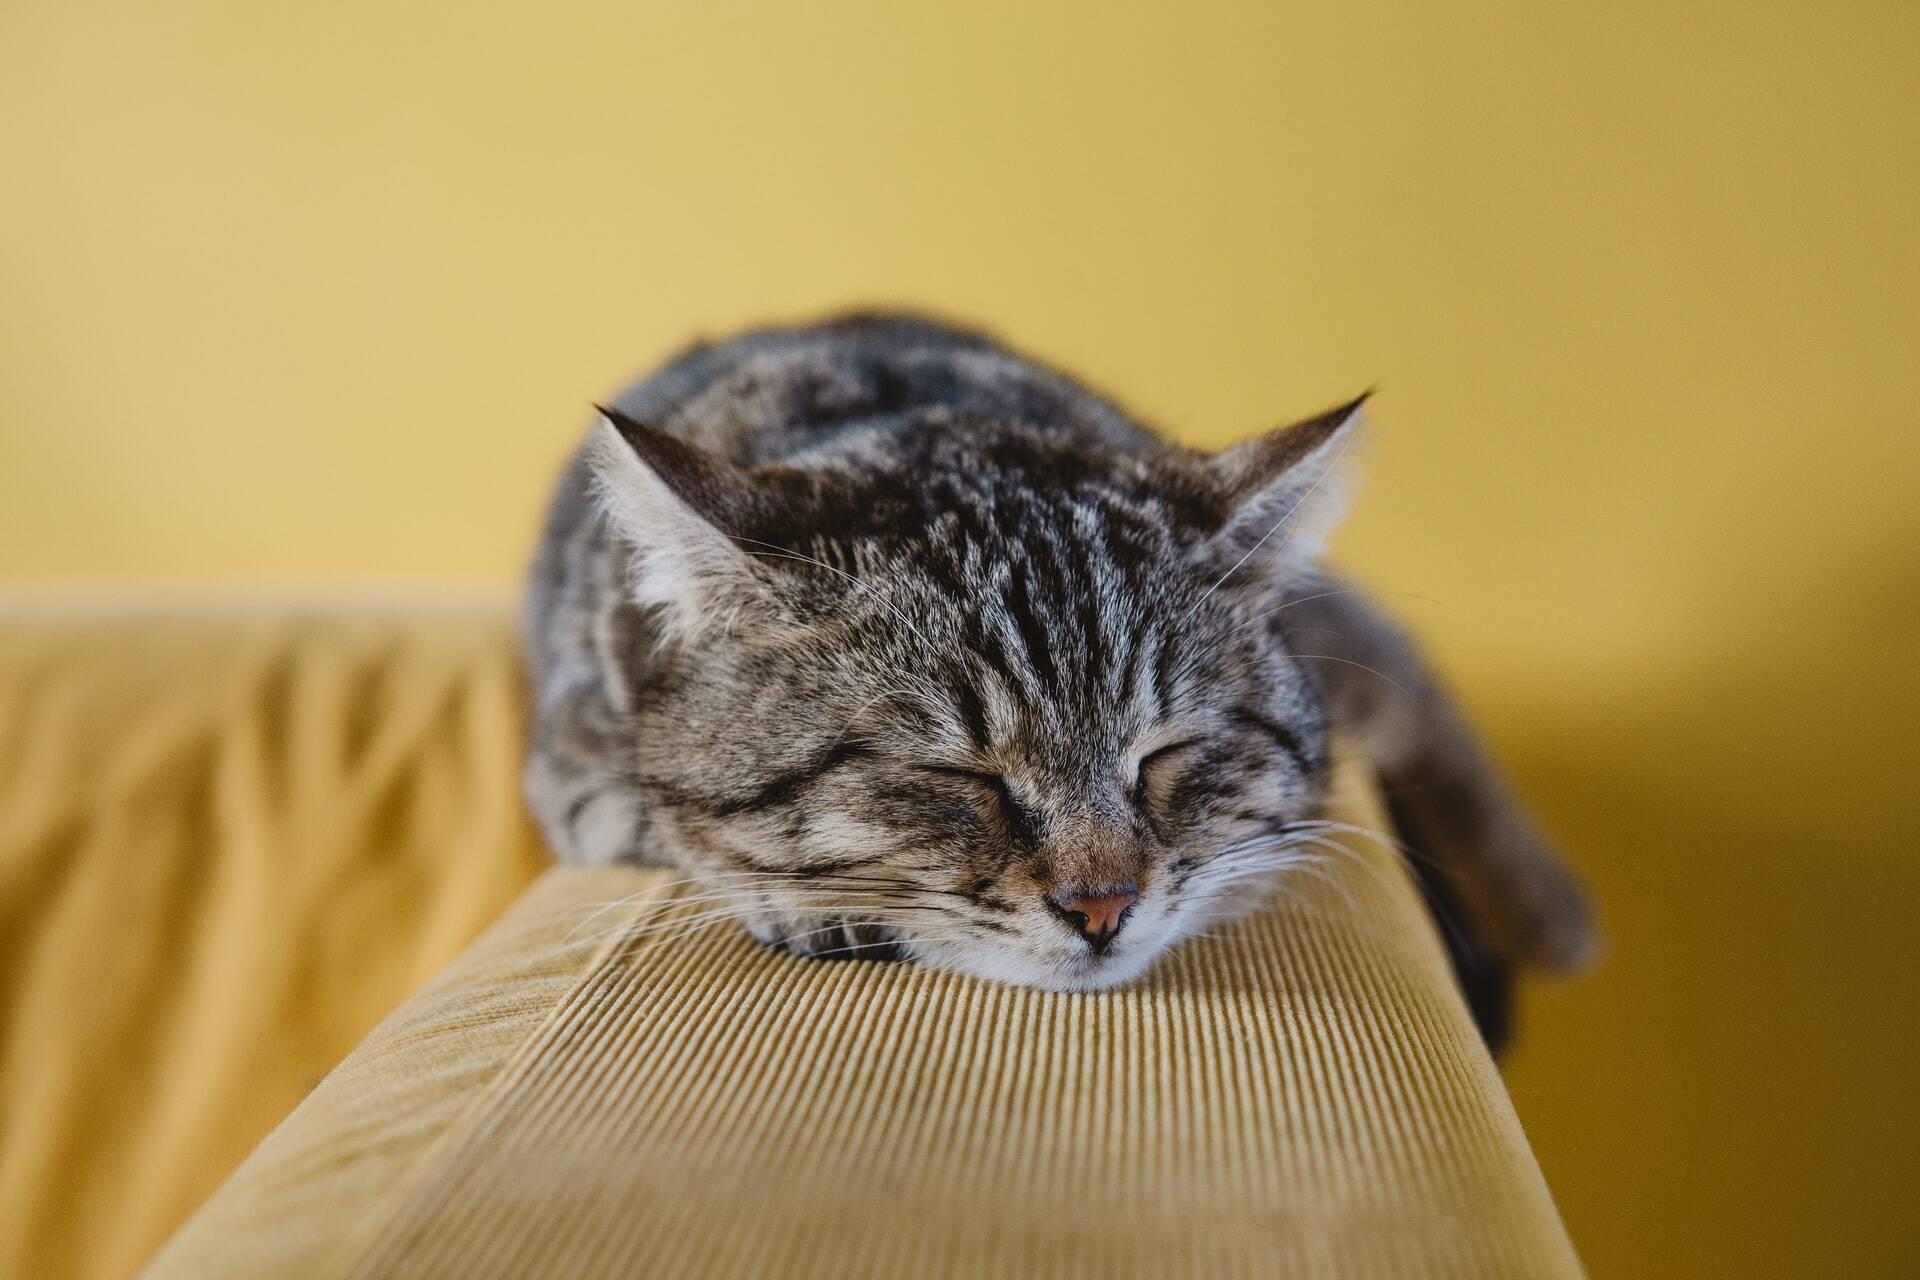 Confira comportamentos do gato que podem indicar problemas de saúde